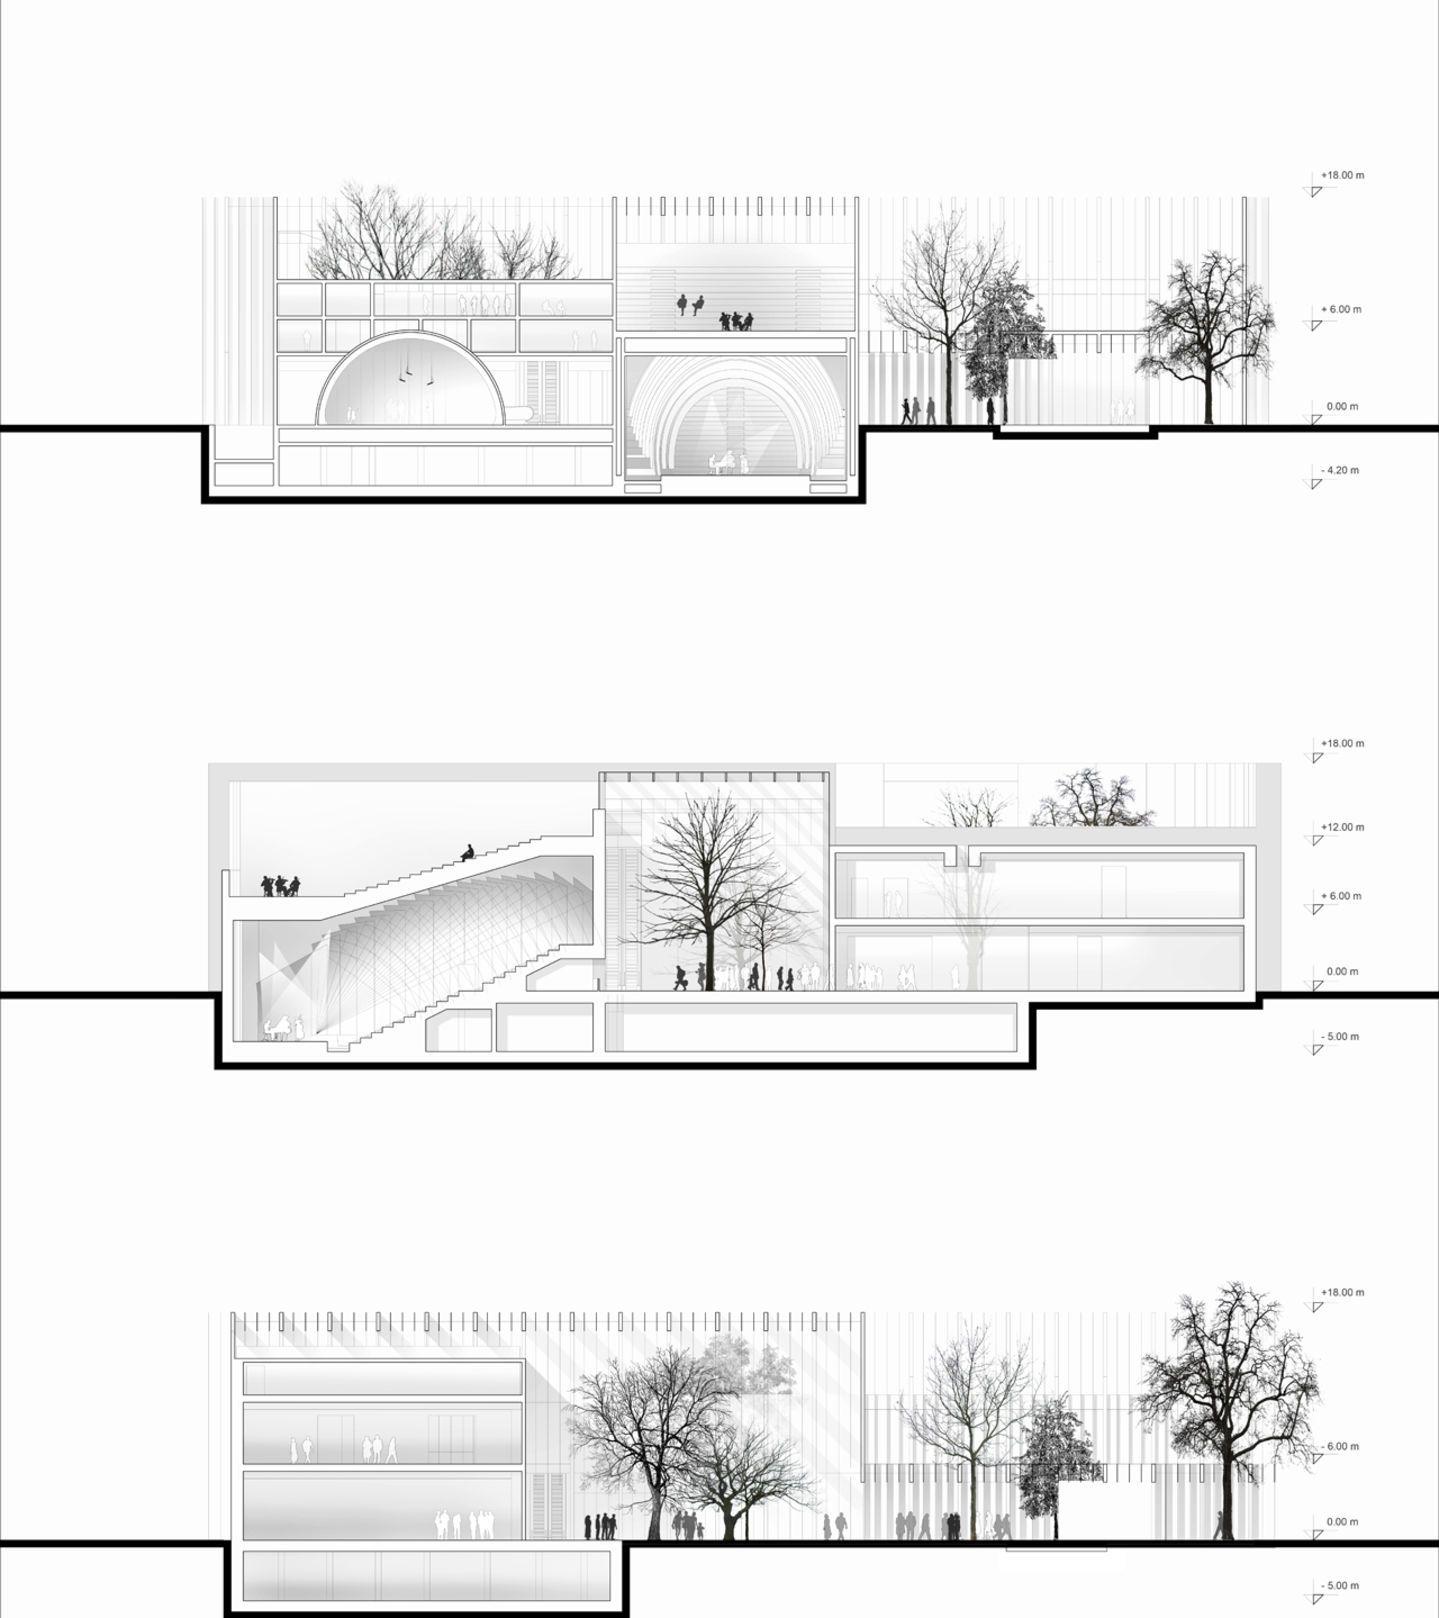 MenoMenoPiu Architects /- - + AA/ · House of Hungarian Music · Divisare